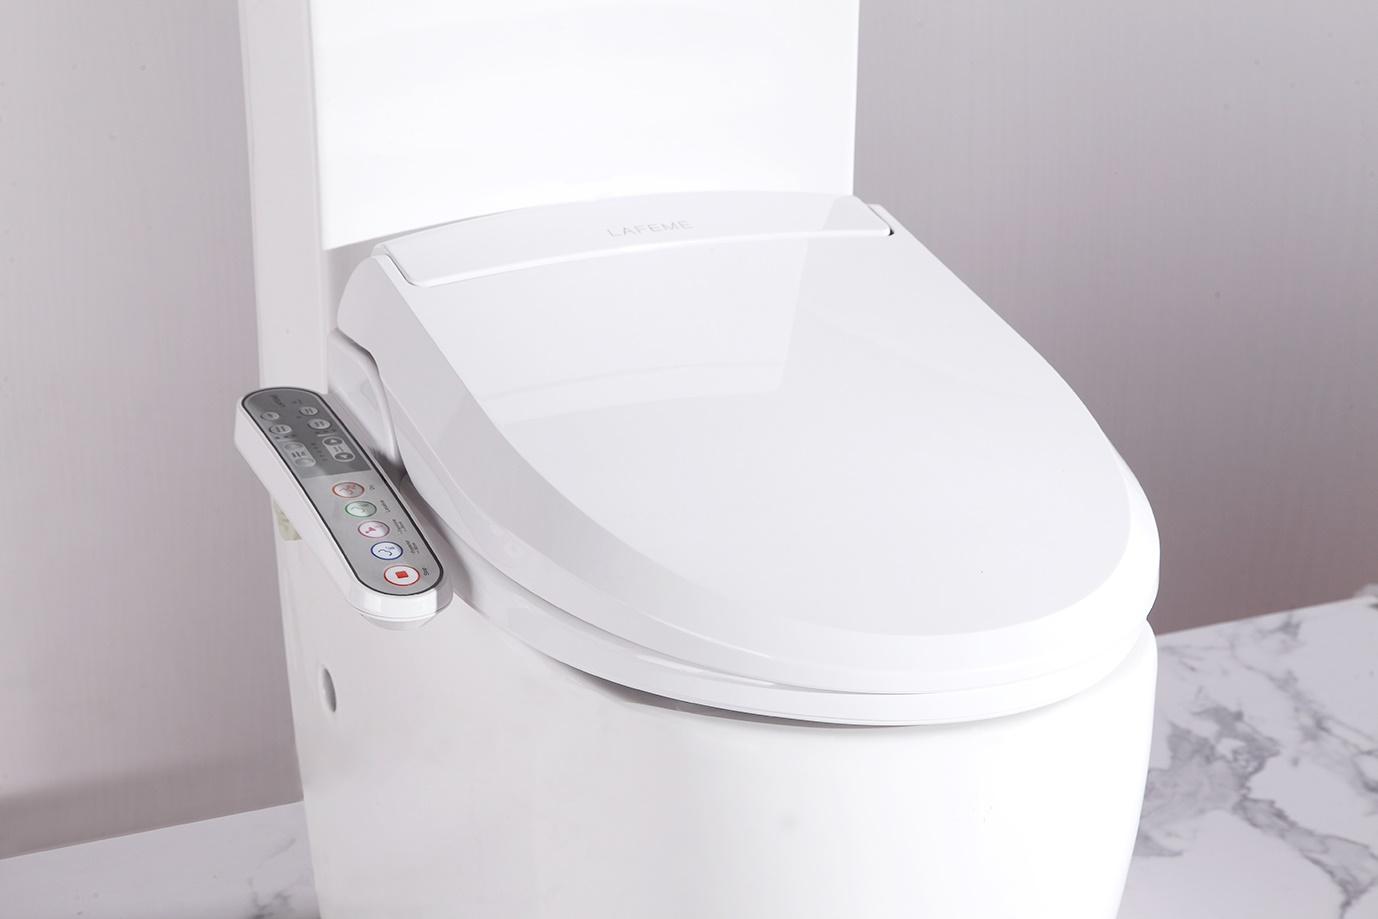 Smart Electric Toilet Bidet Seat Rio Bathroom Warehouse